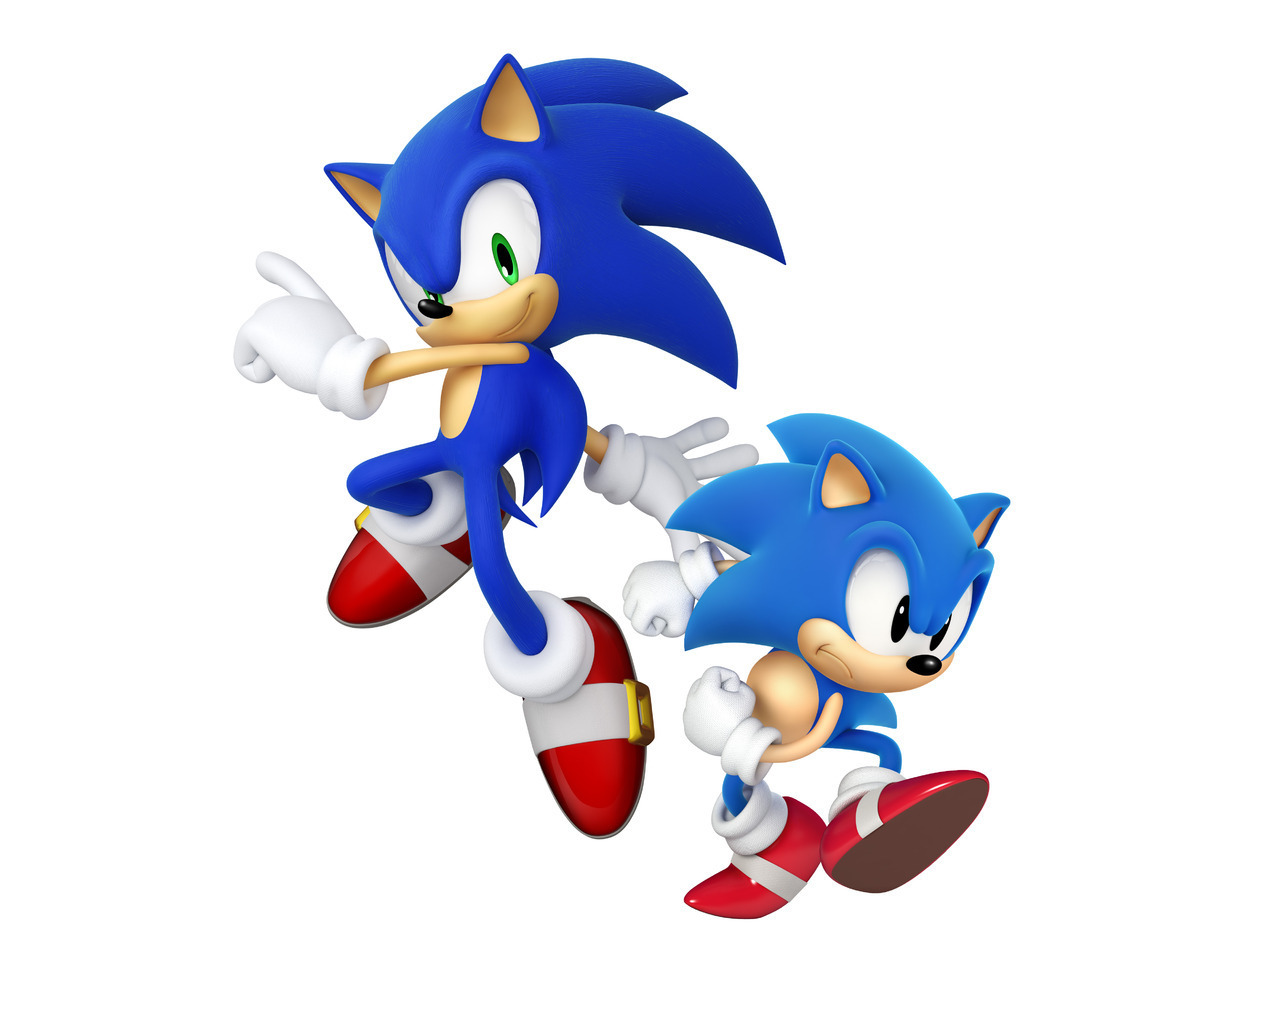 Modern Sonic And Classic Sonic Sonic The Hedgehog Photo 21157735 Fanpop